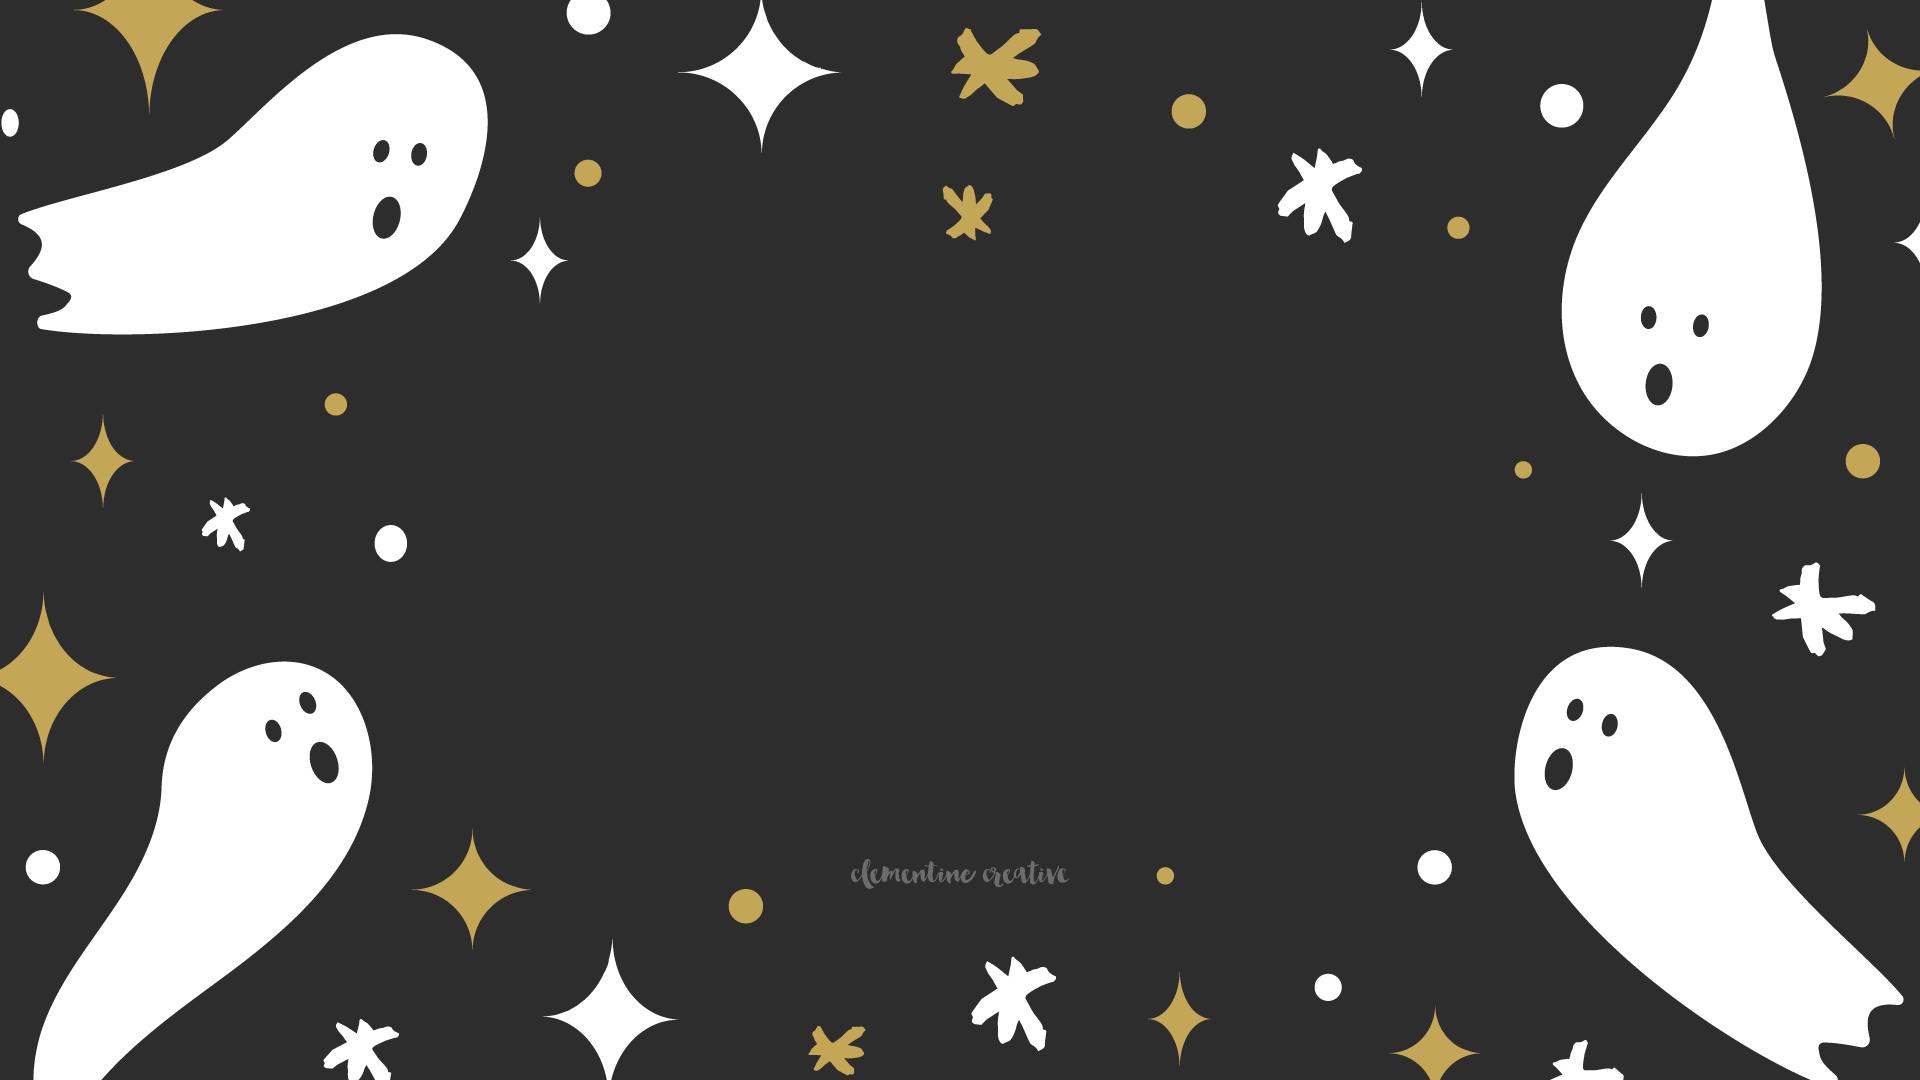 Cute Downloadable Wallpapers Free Halloween Wallpaper Downloads Clementine Creative